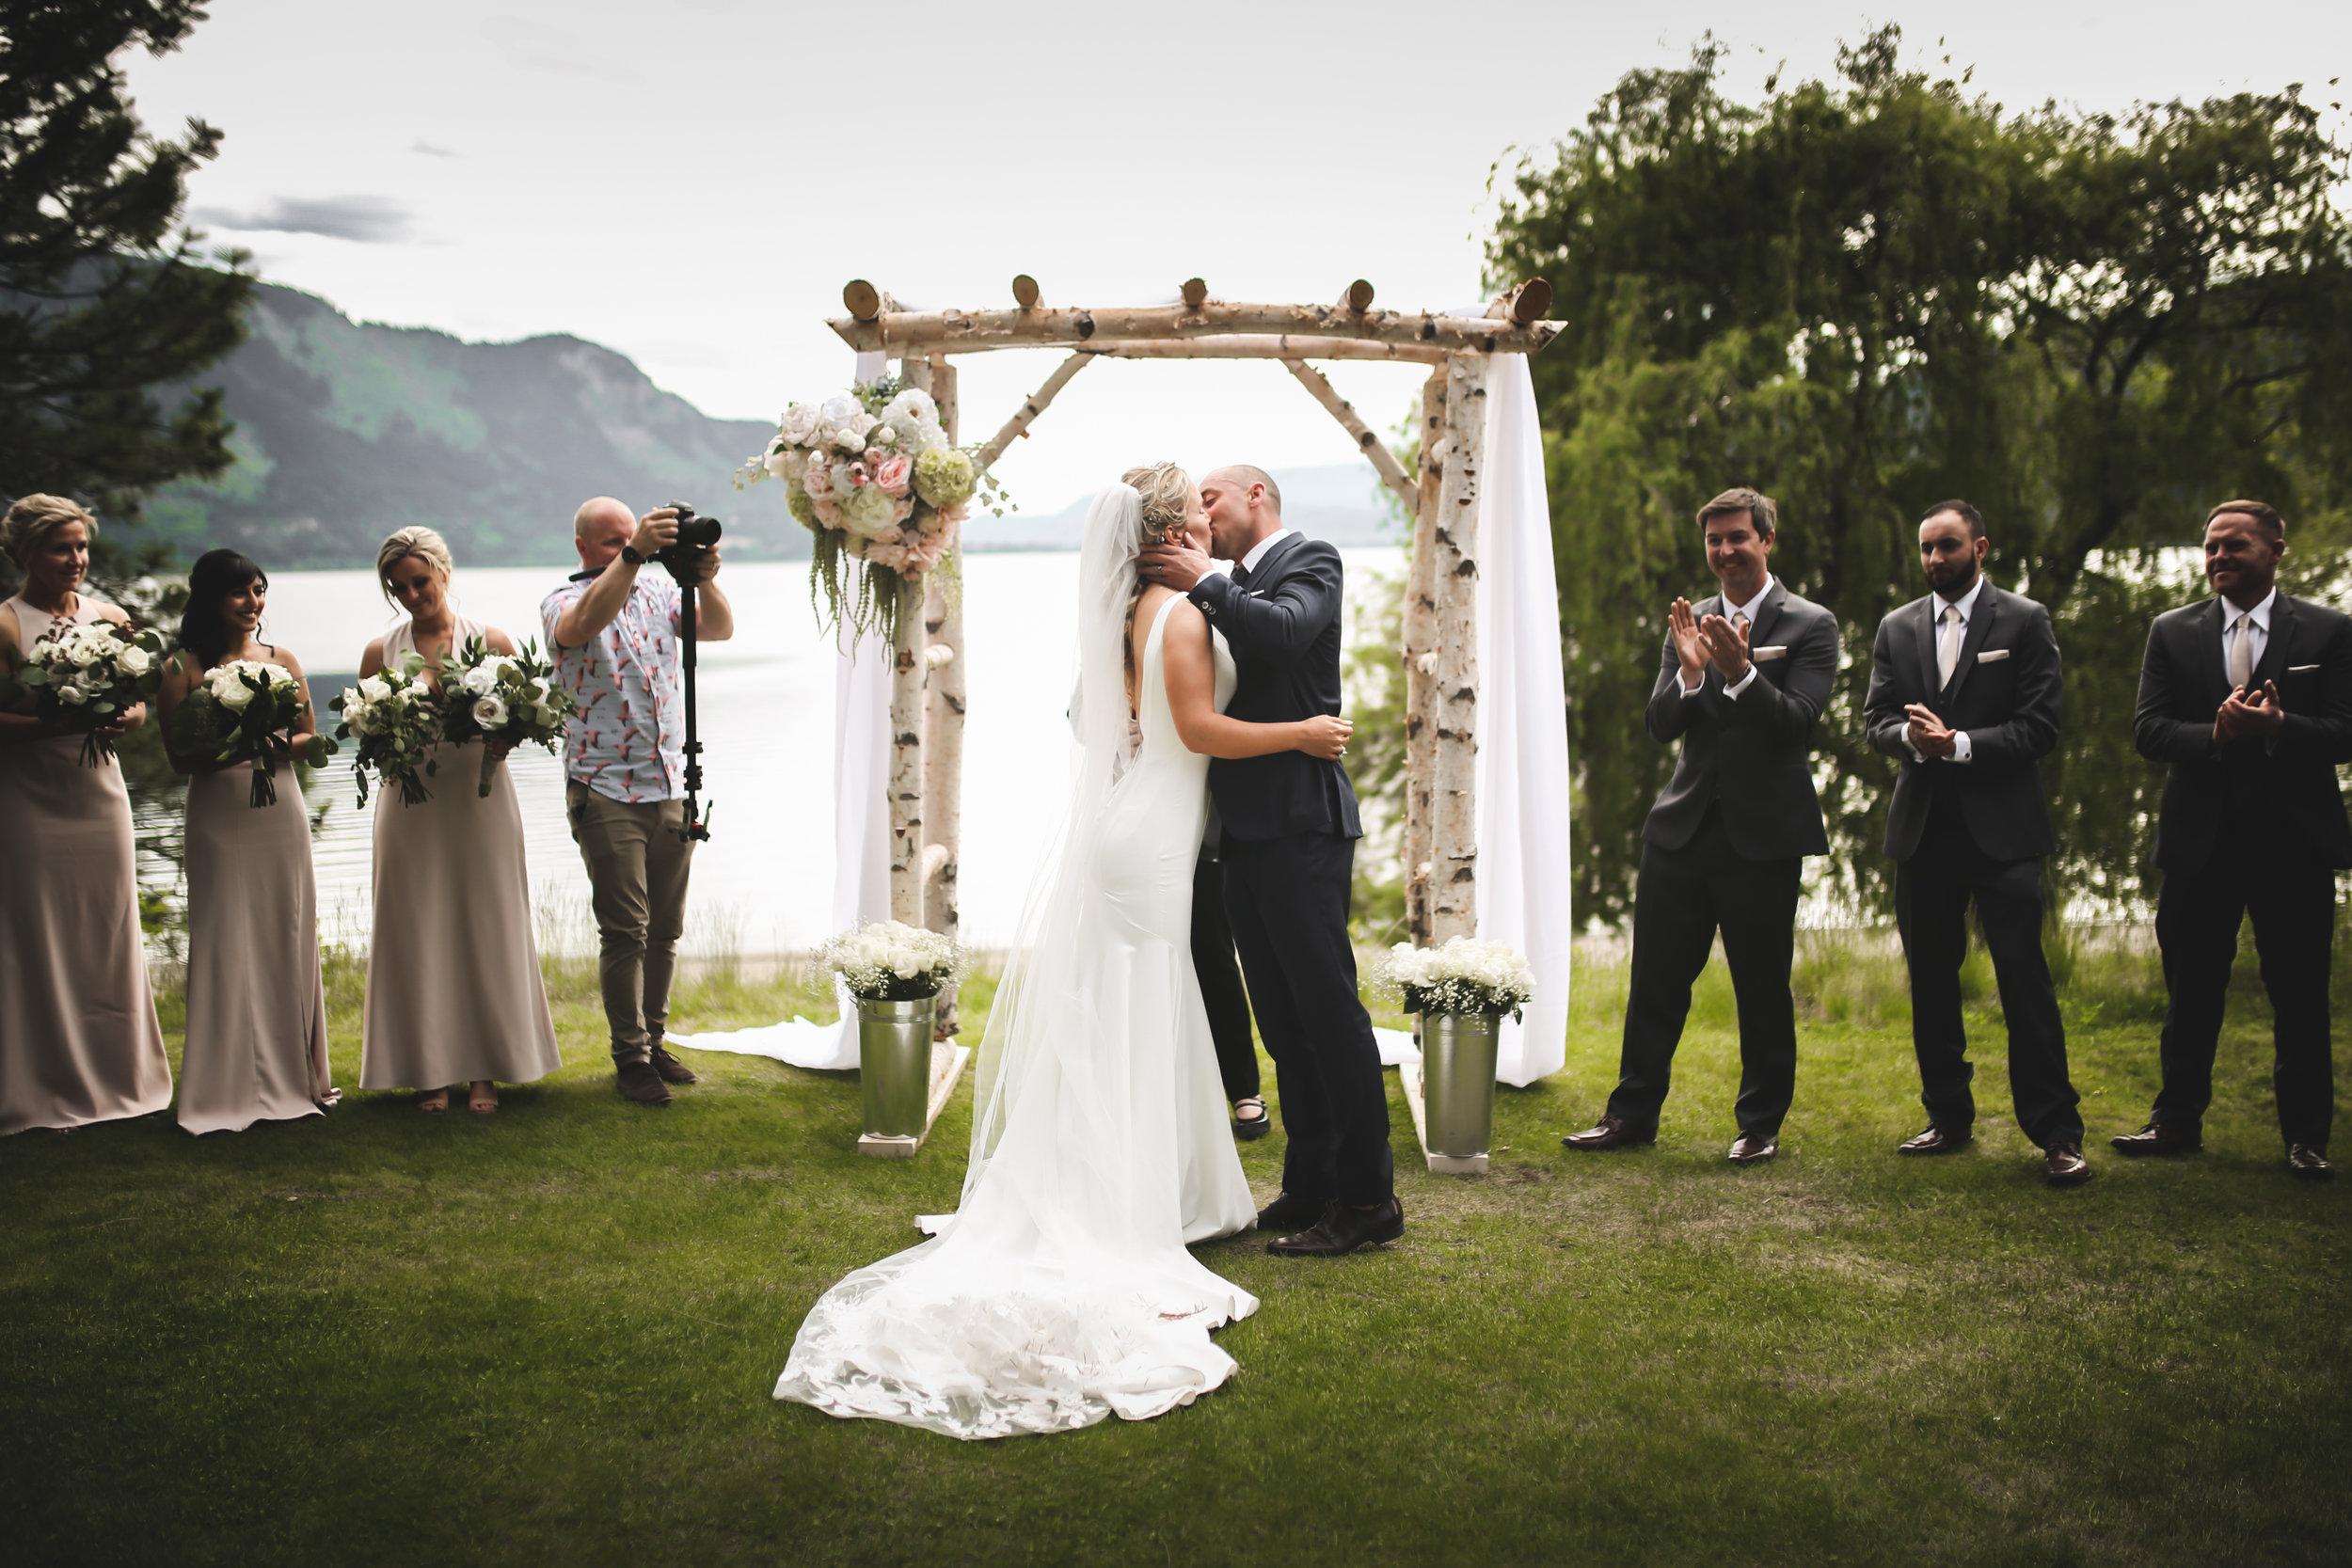 18 Adam Ziorio Photography - Kate & Ben's Wedding.jpg